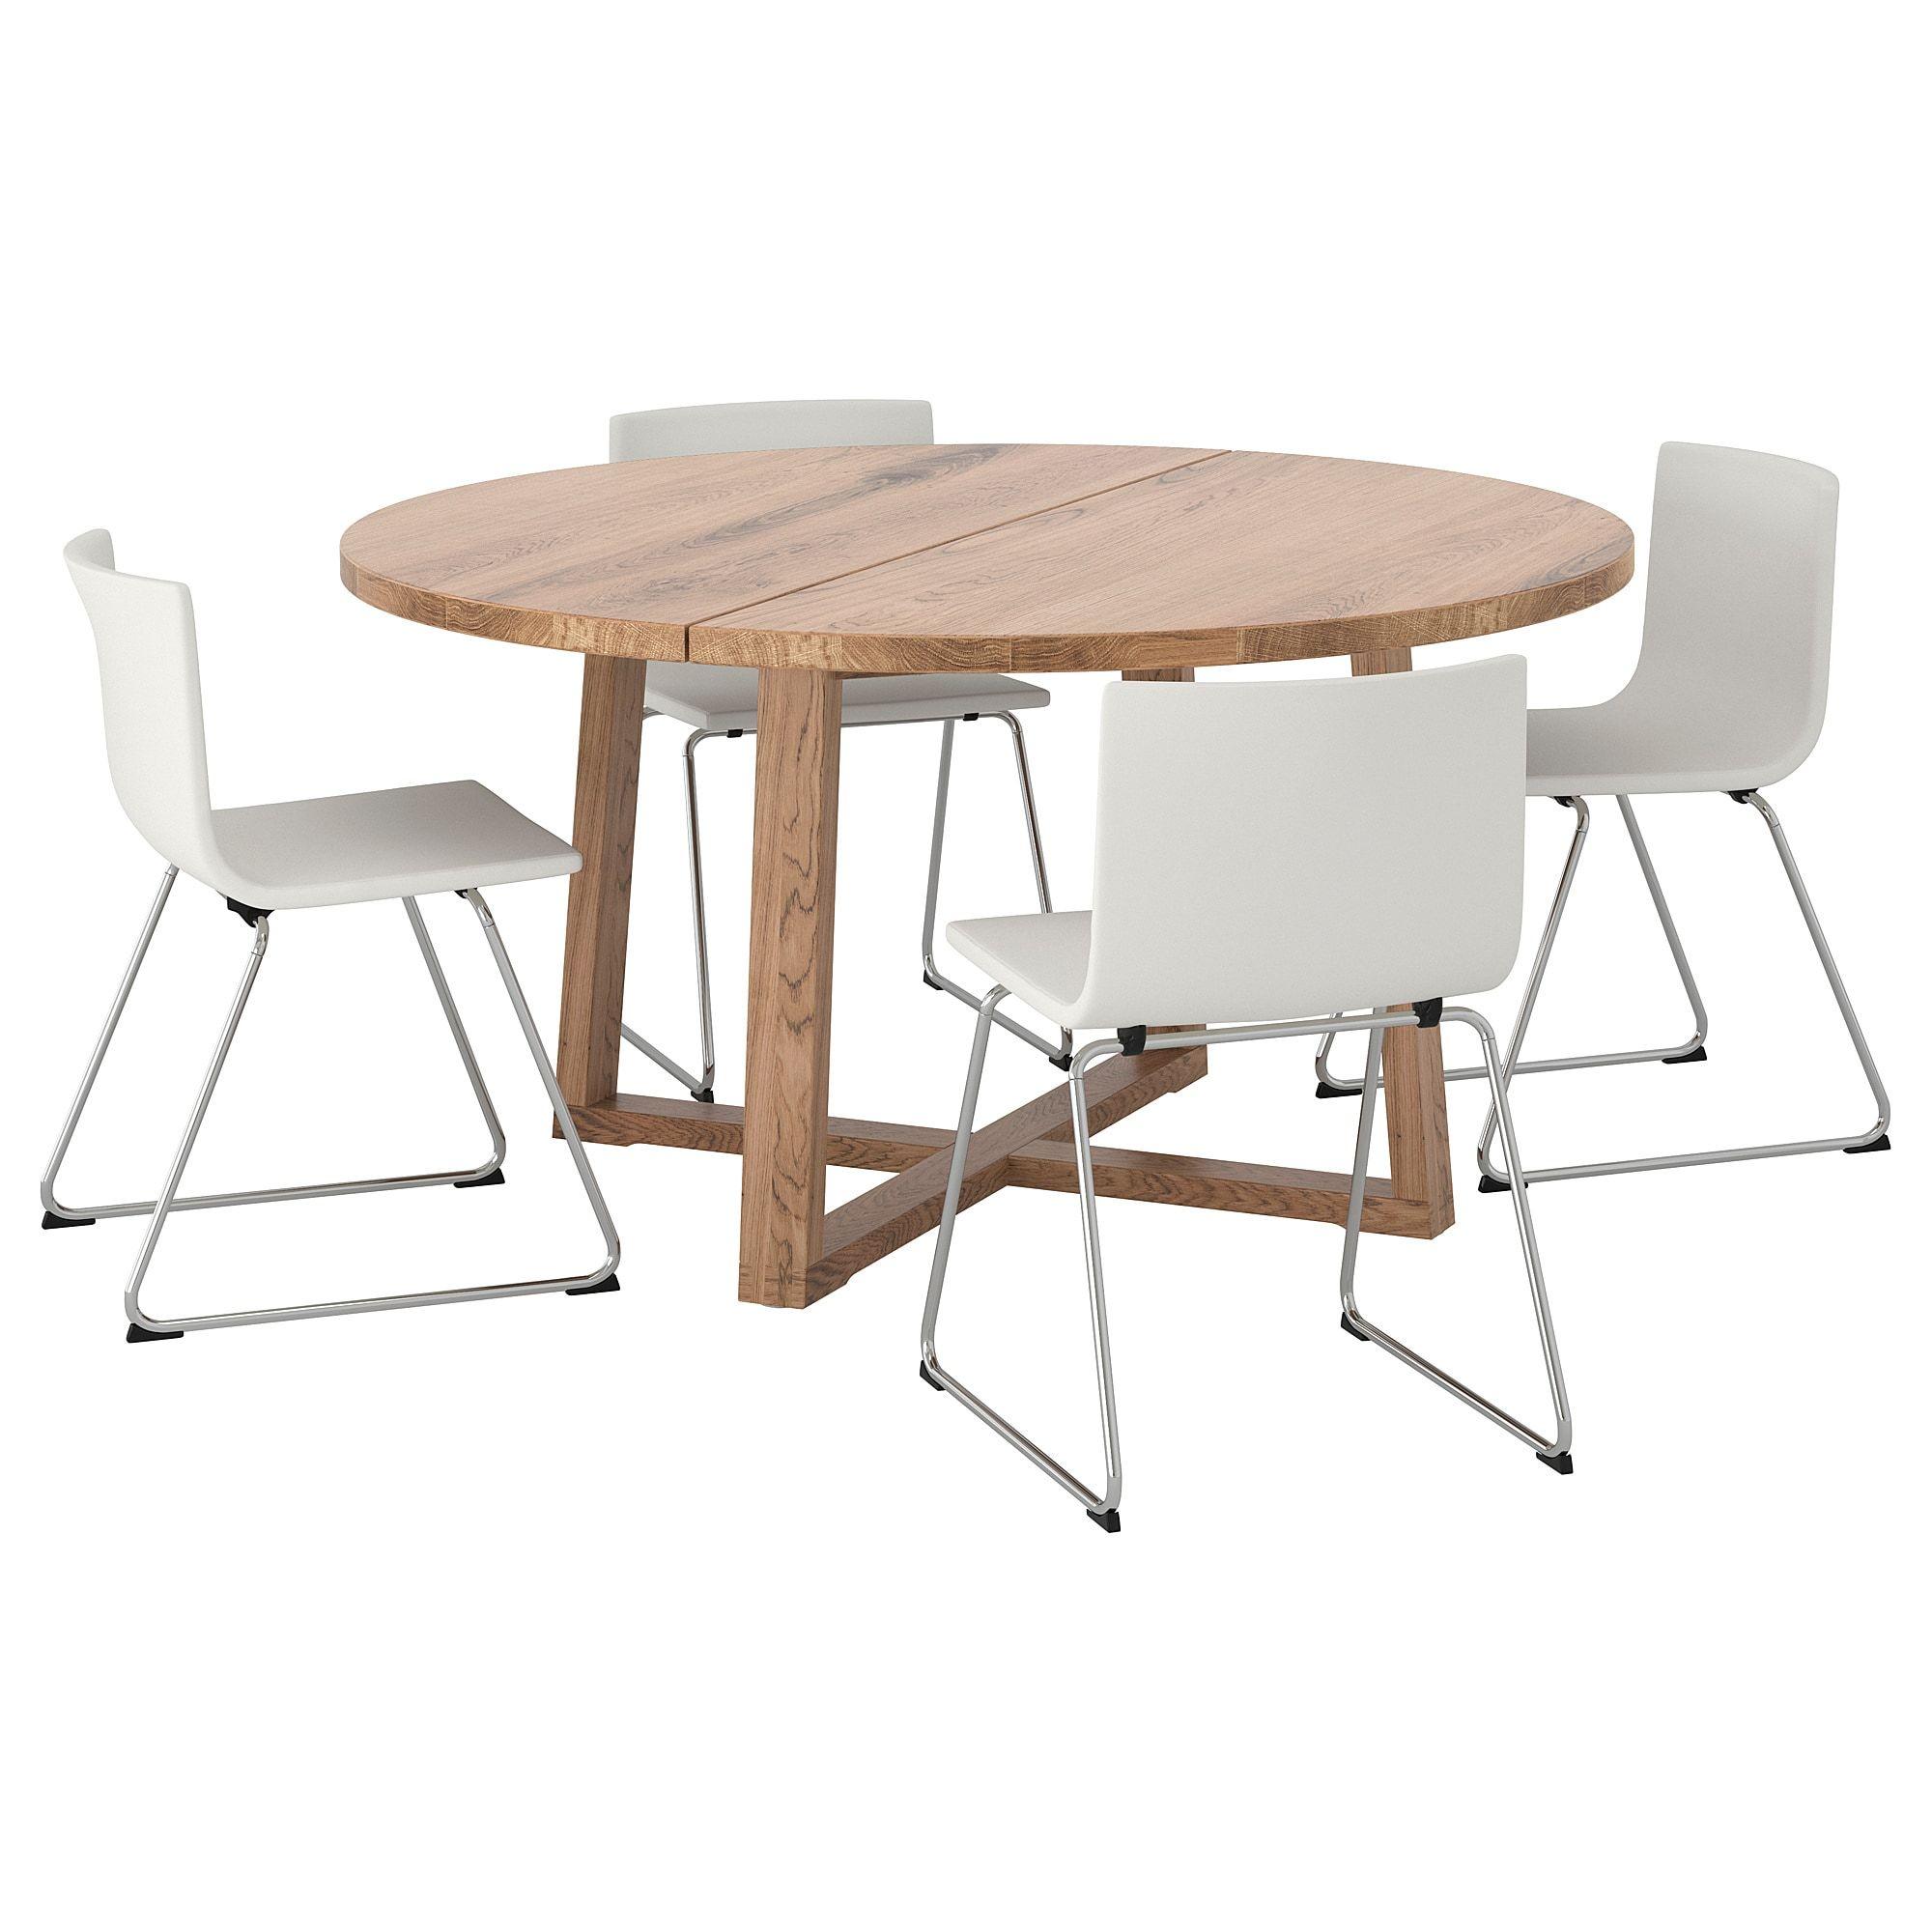 Morbylanga Bernhard Table And 4 Chairs Oak Veneer Brown Stained Mjuk White Ikea Furniture Coffee Table Ikea [ 2000 x 2000 Pixel ]